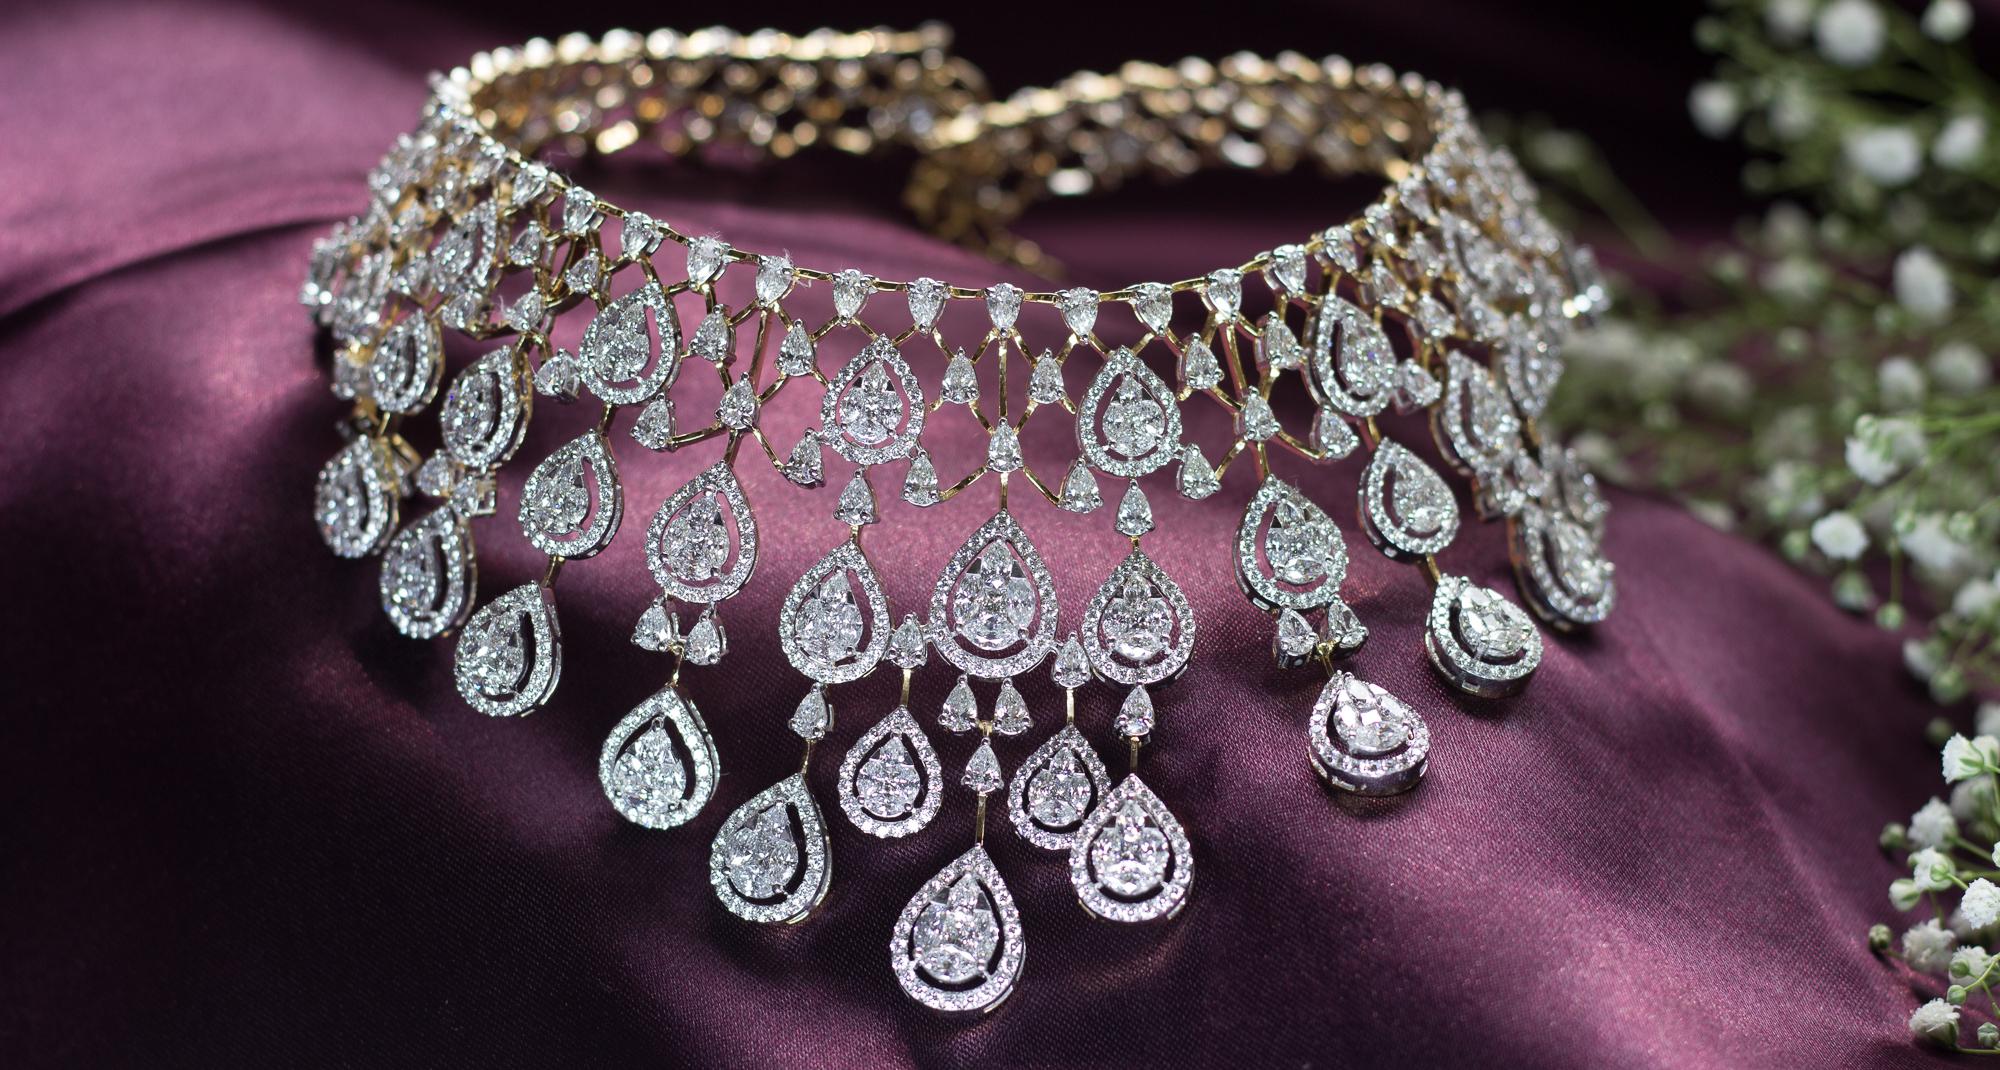 Shailja's Diamond jewelery